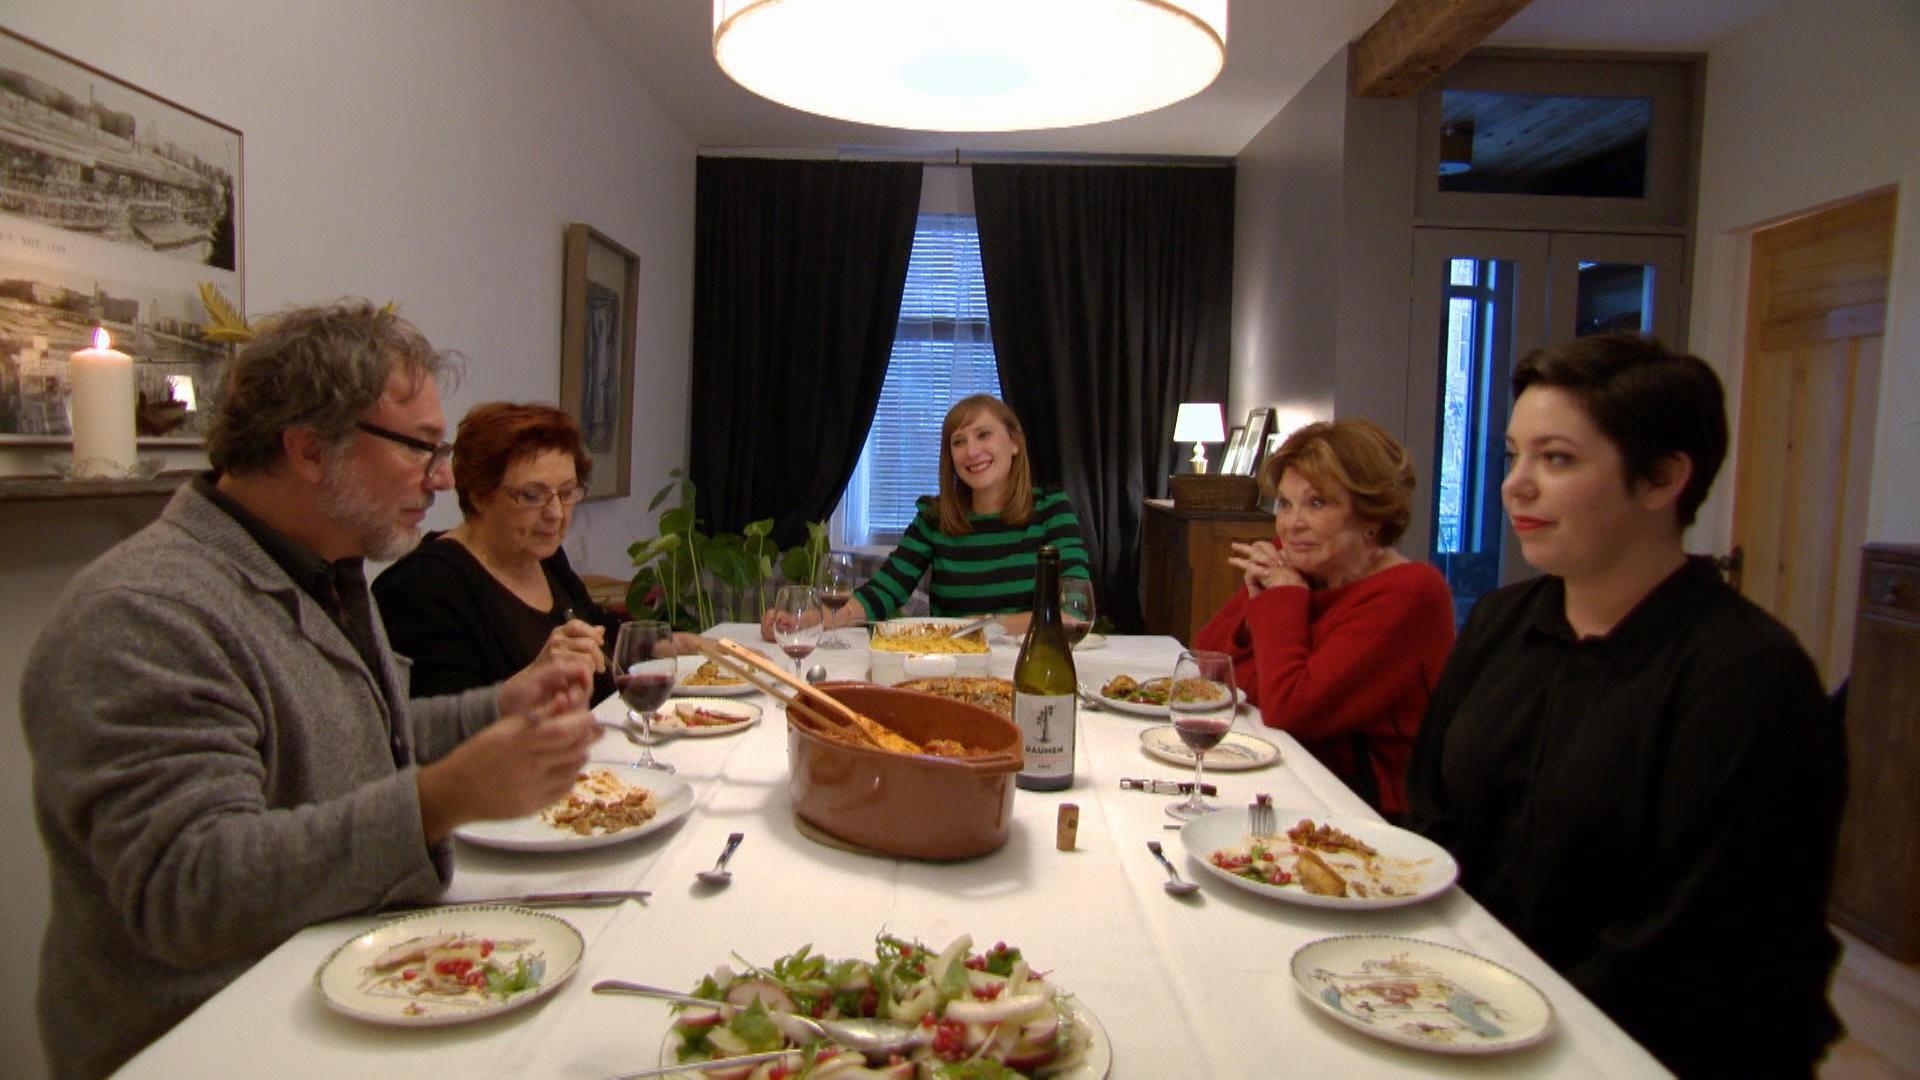 Cuisine de grand m re janette bertrand rita lafontaine - La cuisine de bertrand ...